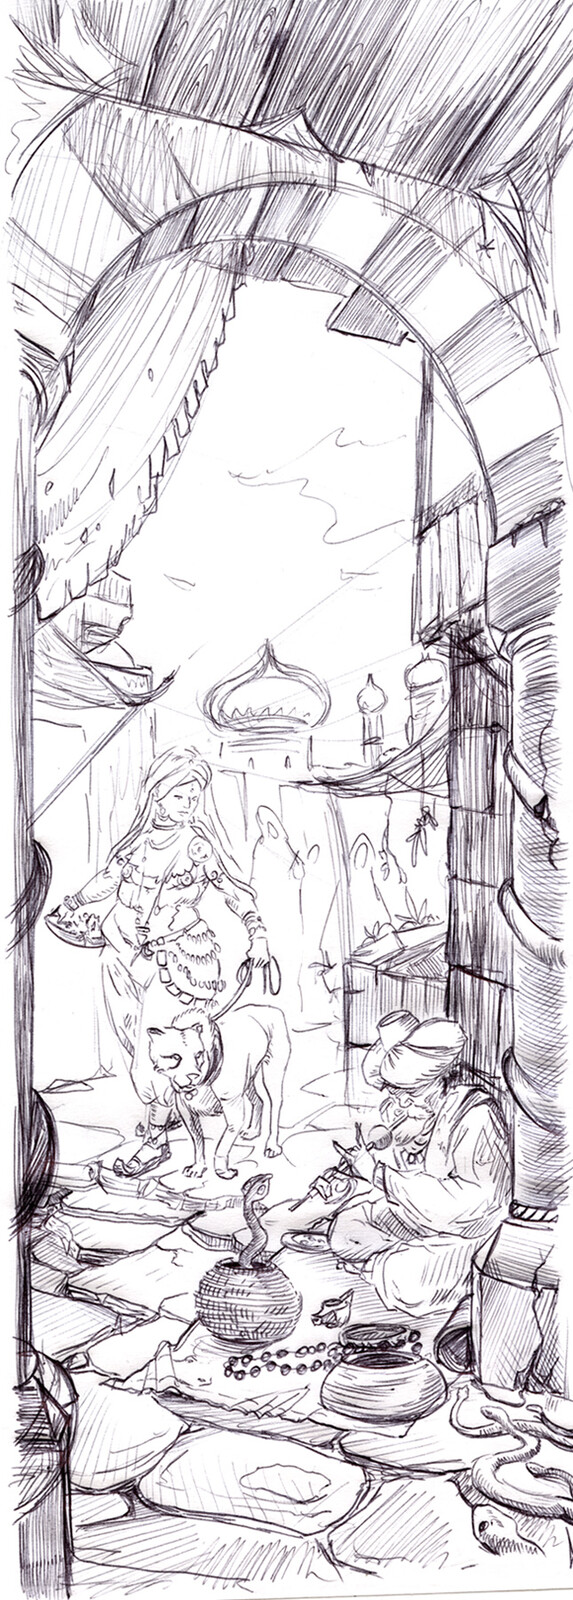 Ballpen Sketch